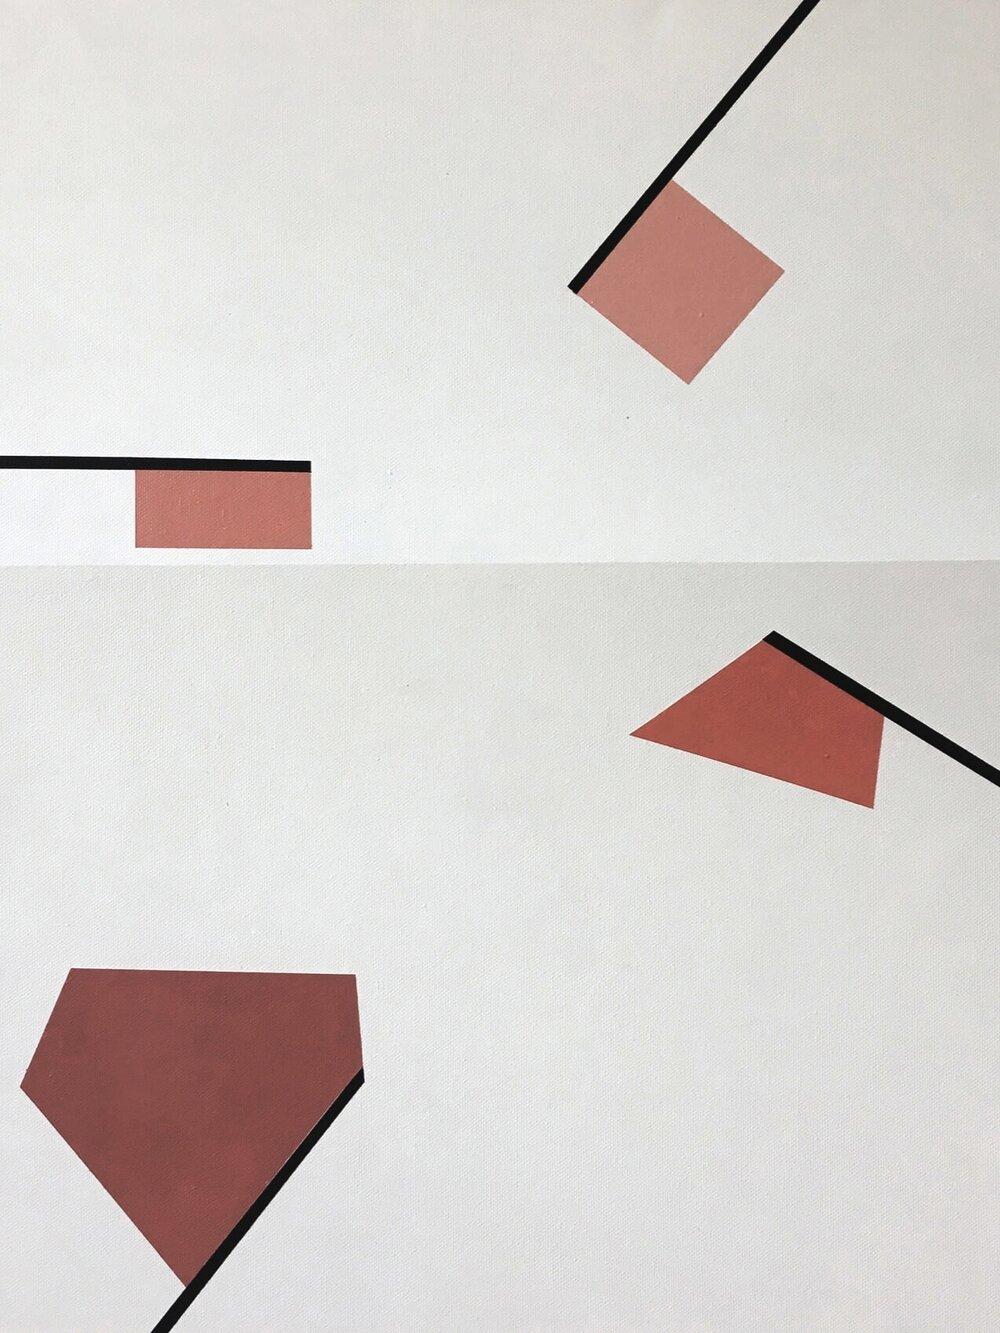 Minimal 11, 60 cm x 50 x 4cm, Acryl auf Leinwand, © Ute Latzke, 2016, 500,- Euro.